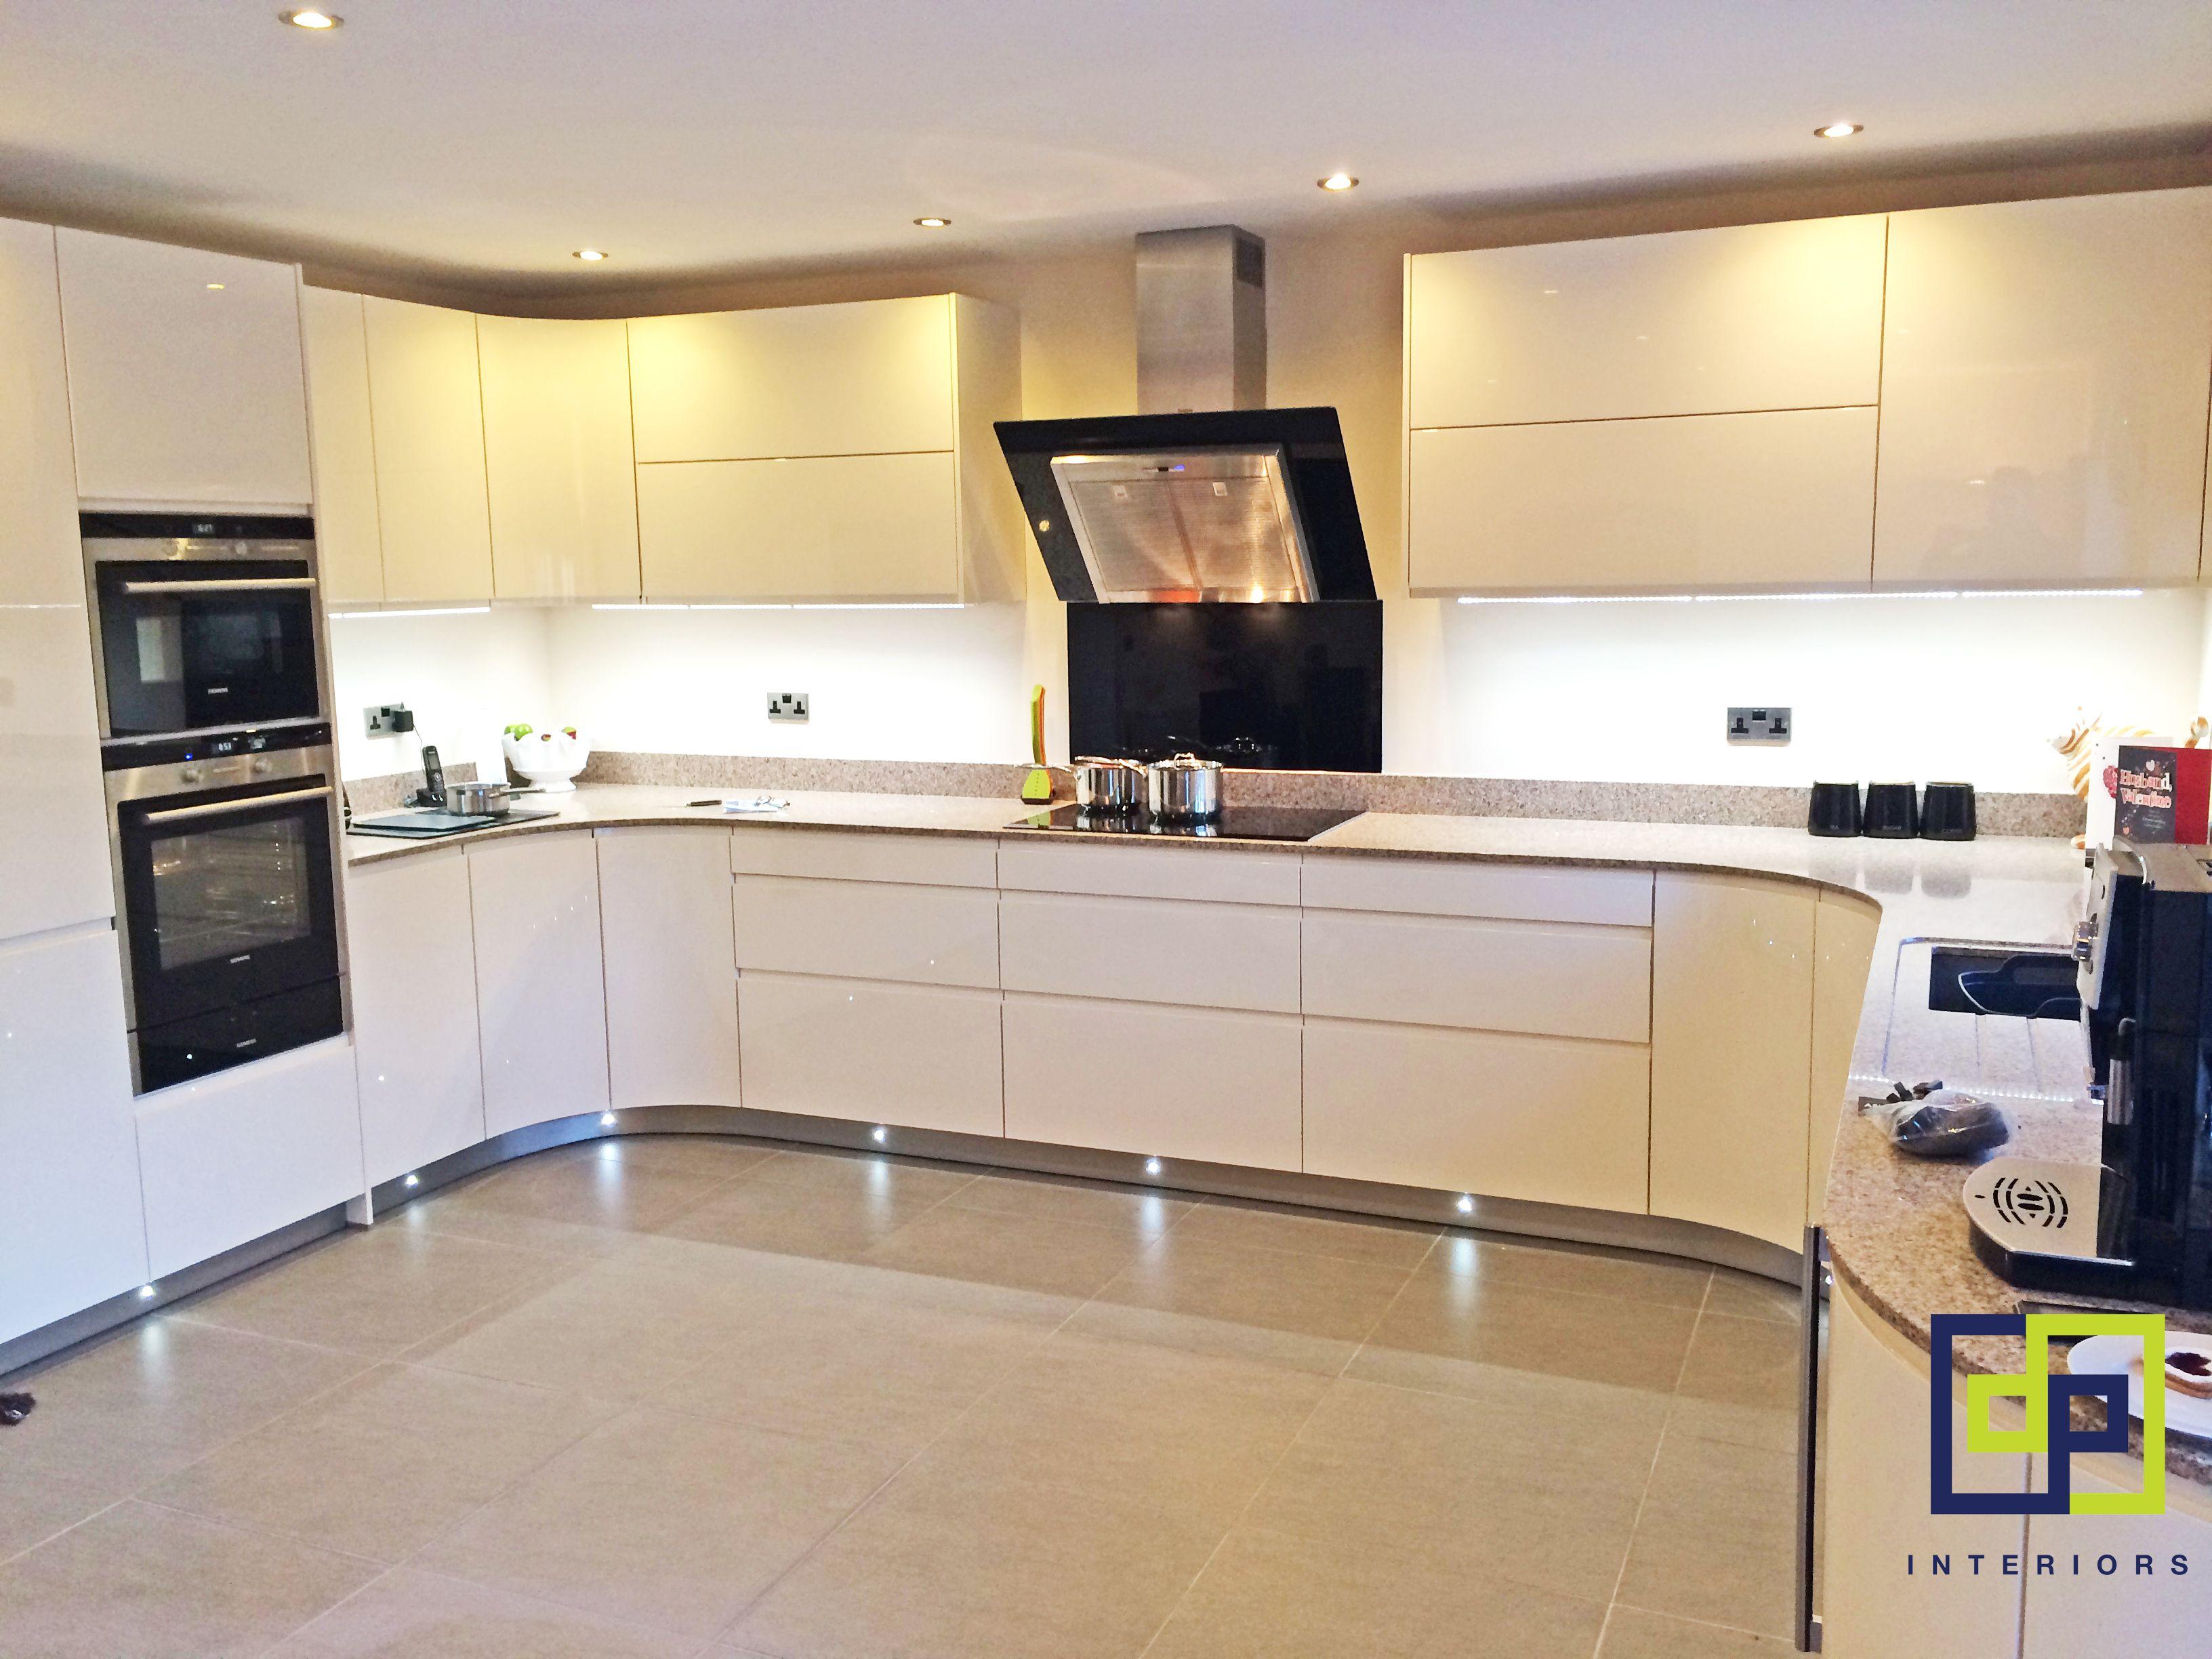 Our Previous Work Dp Interiors Of Preston Lancashire Kitchen Fittings Plinth Lighting Kitchens Bathrooms